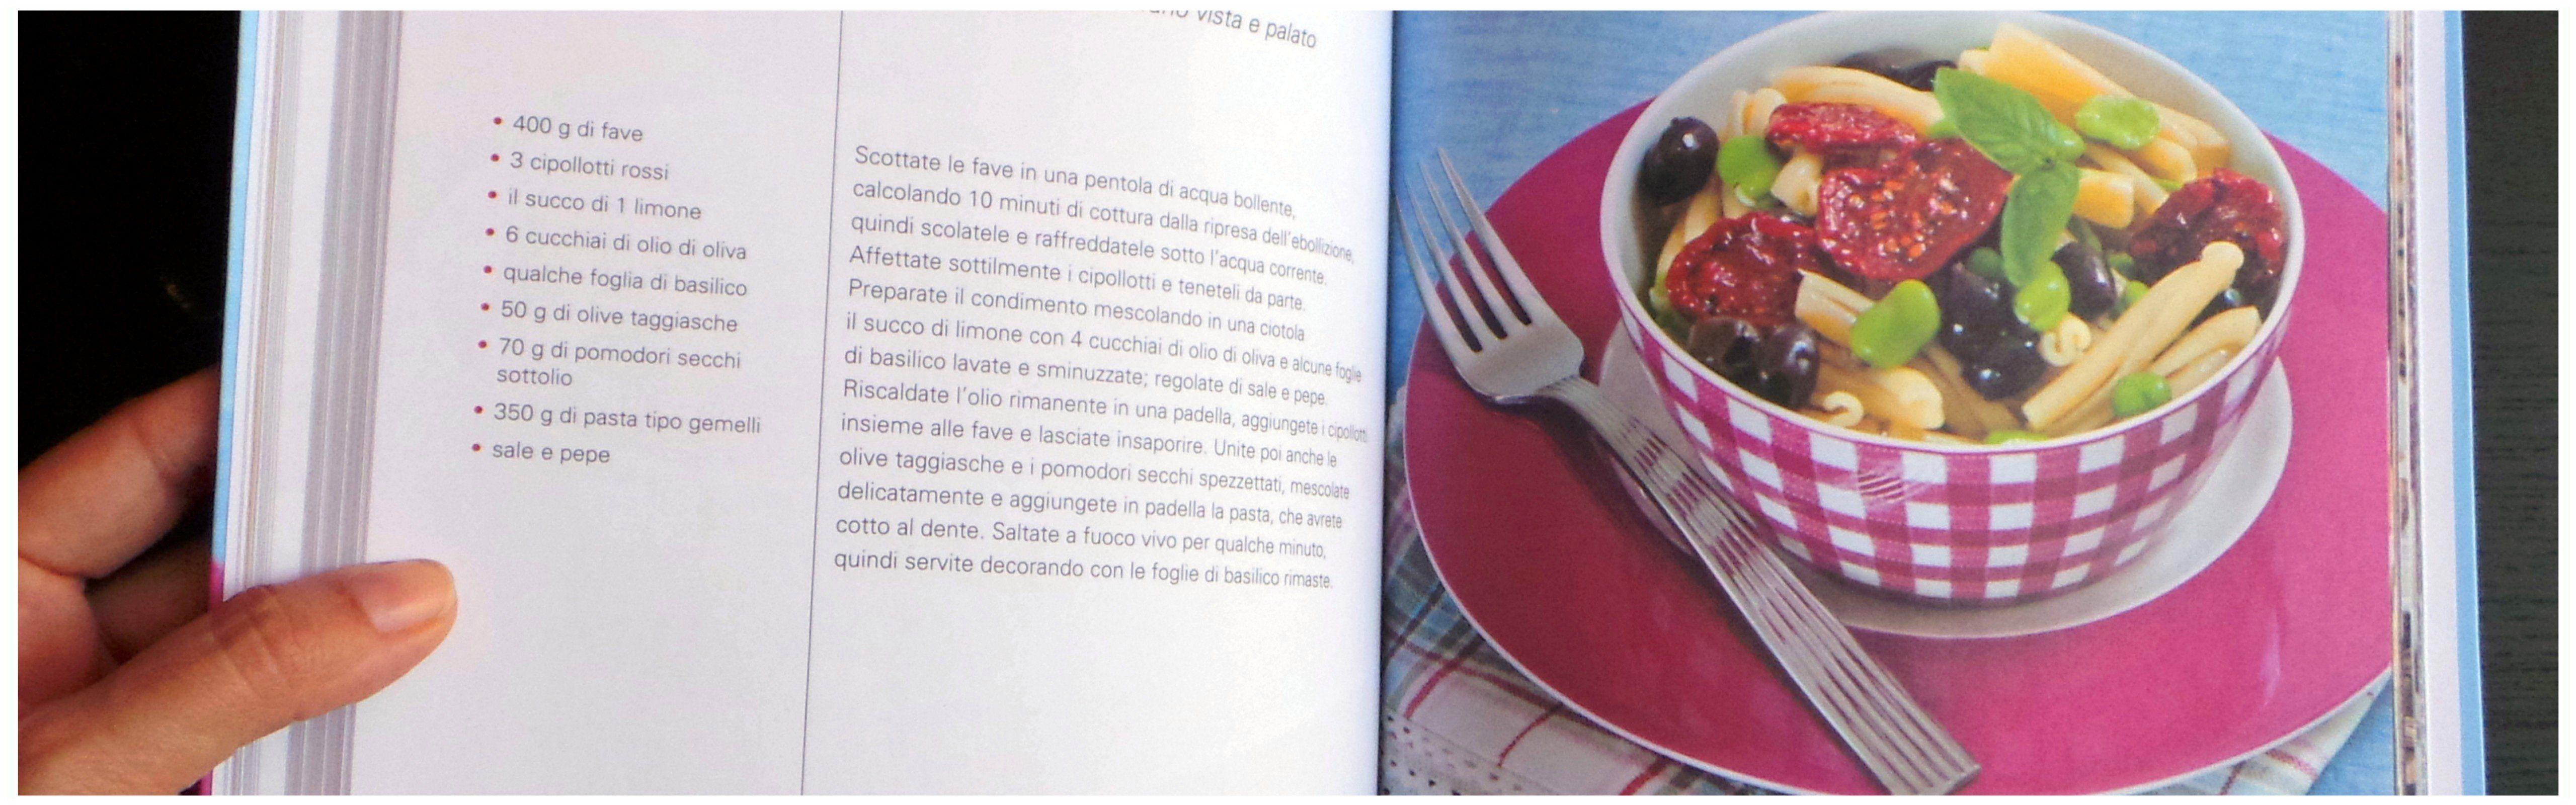 Cucinare low cost\